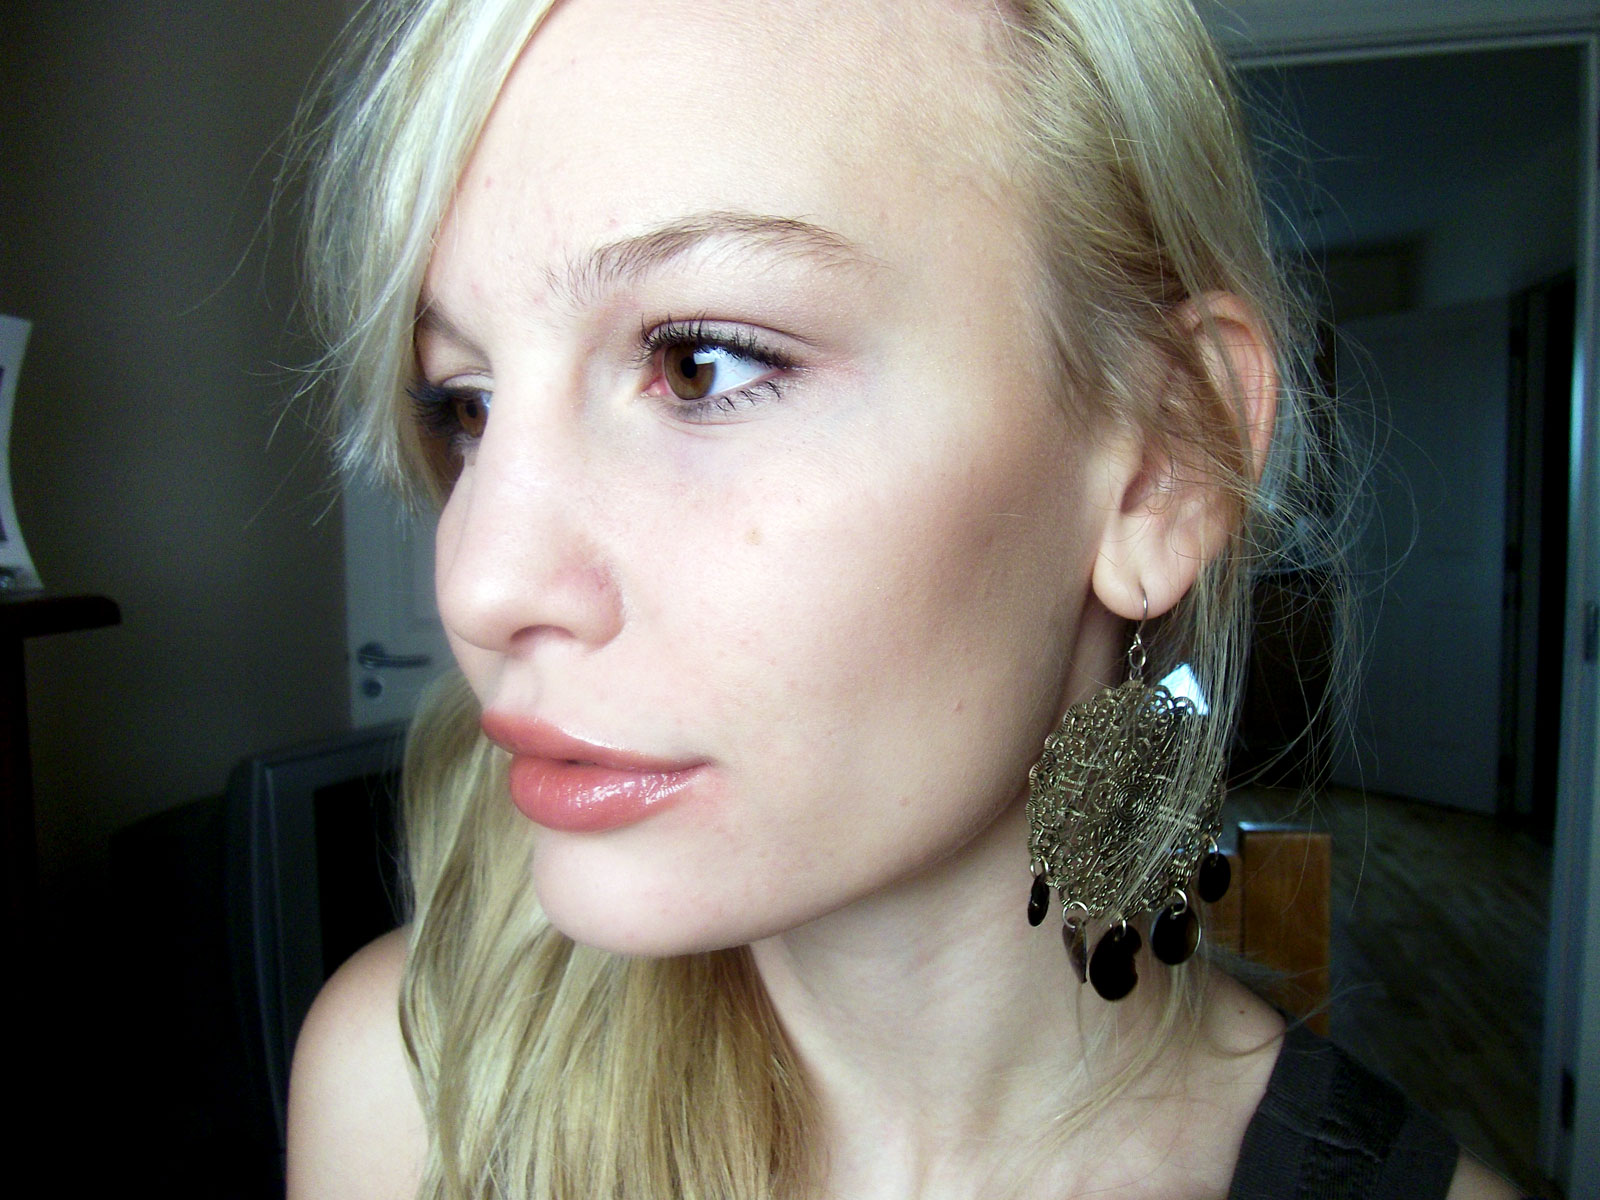 http://1.bp.blogspot.com/_NwQtJRkWjdo/TPuwS8jOF2I/AAAAAAAAGWo/xE0mCy0eJlk/s1600/Anna-Saccone-Profile.jpg